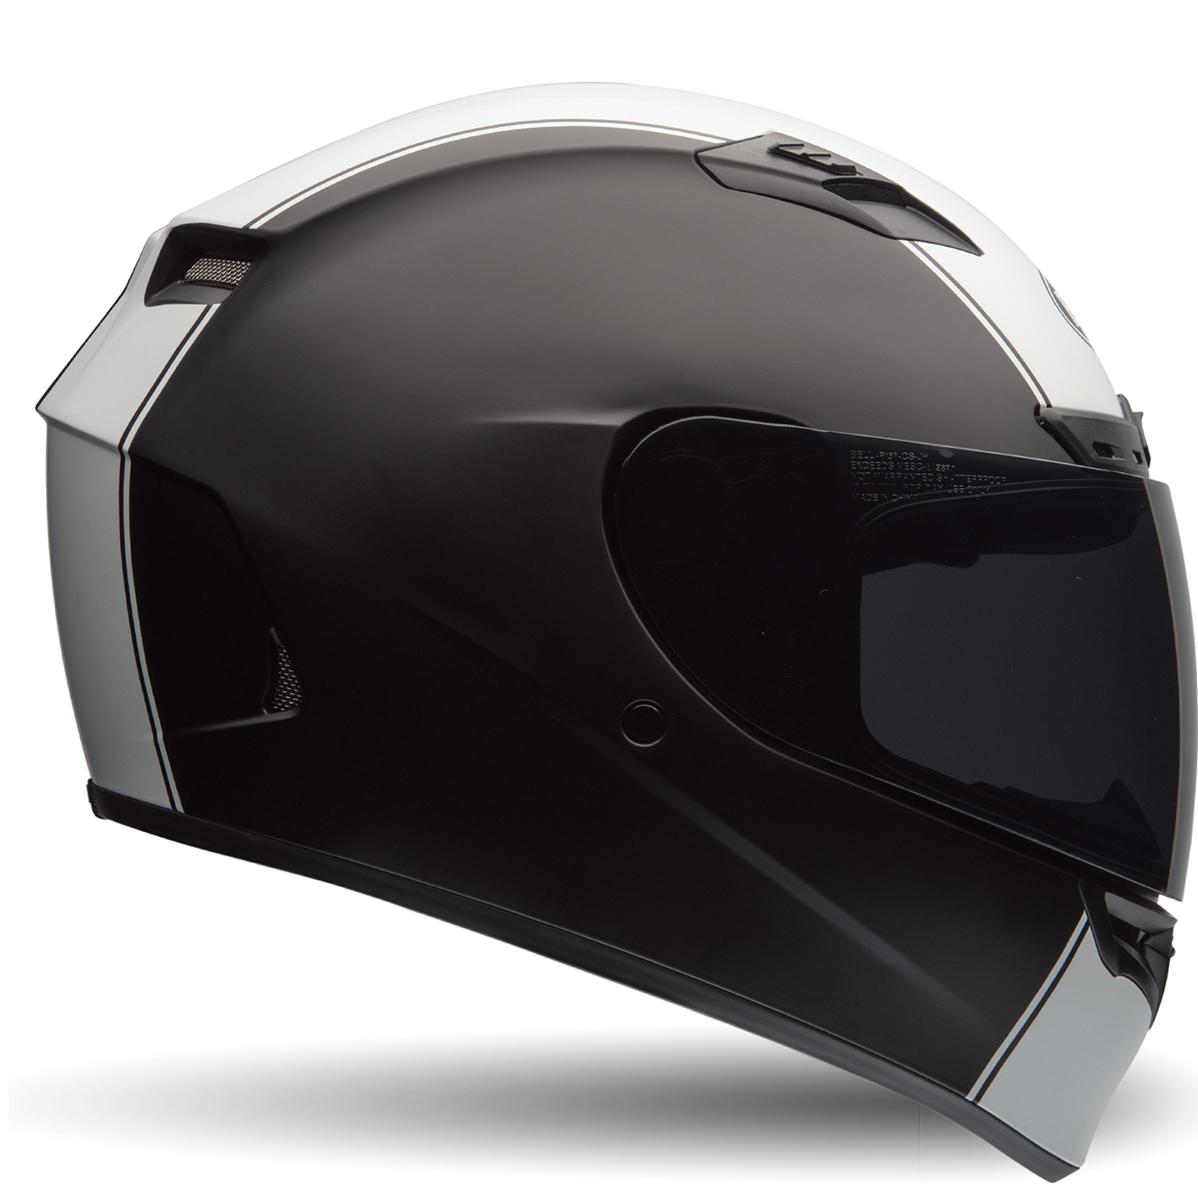 f3a3209a Bell Qualifier DLX Rally Matt Black White Motorcycle Helmet & Race ...